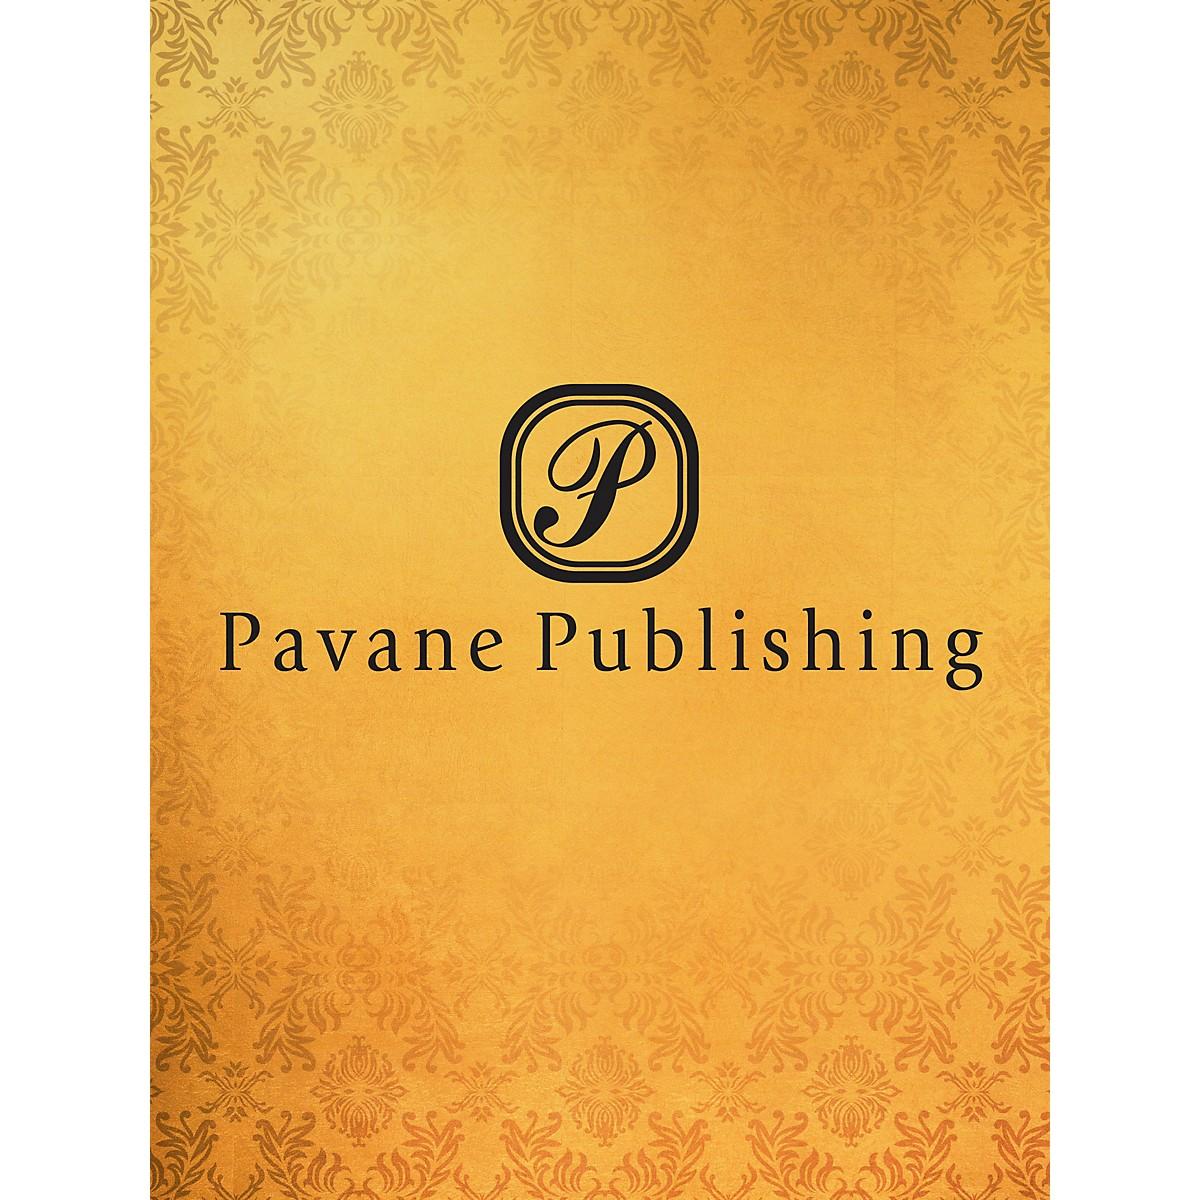 Pavane Finales Fantastique (Collection) SATB Arranged by Allan Robert Petker